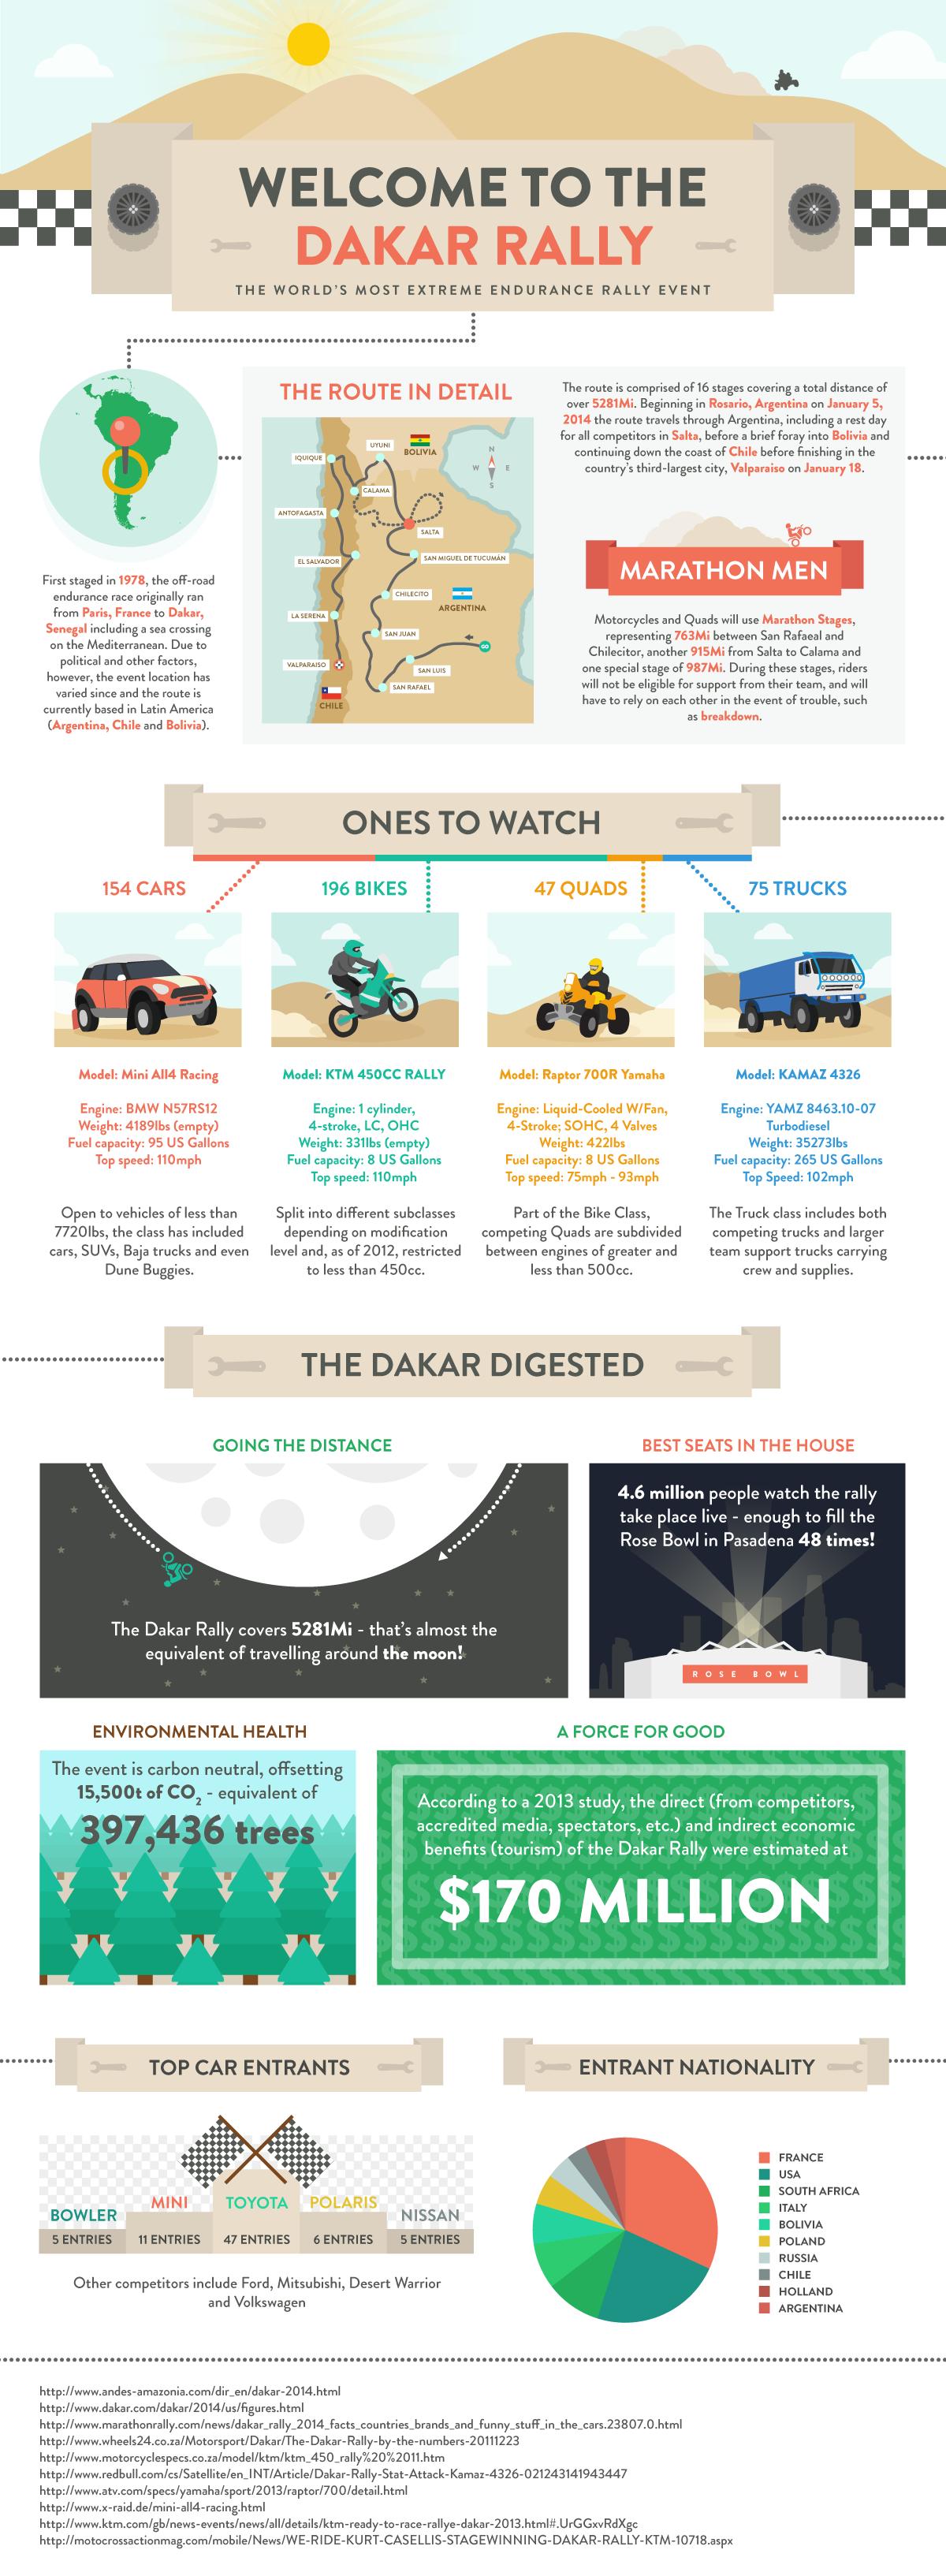 Welcome to the Dakar Rally